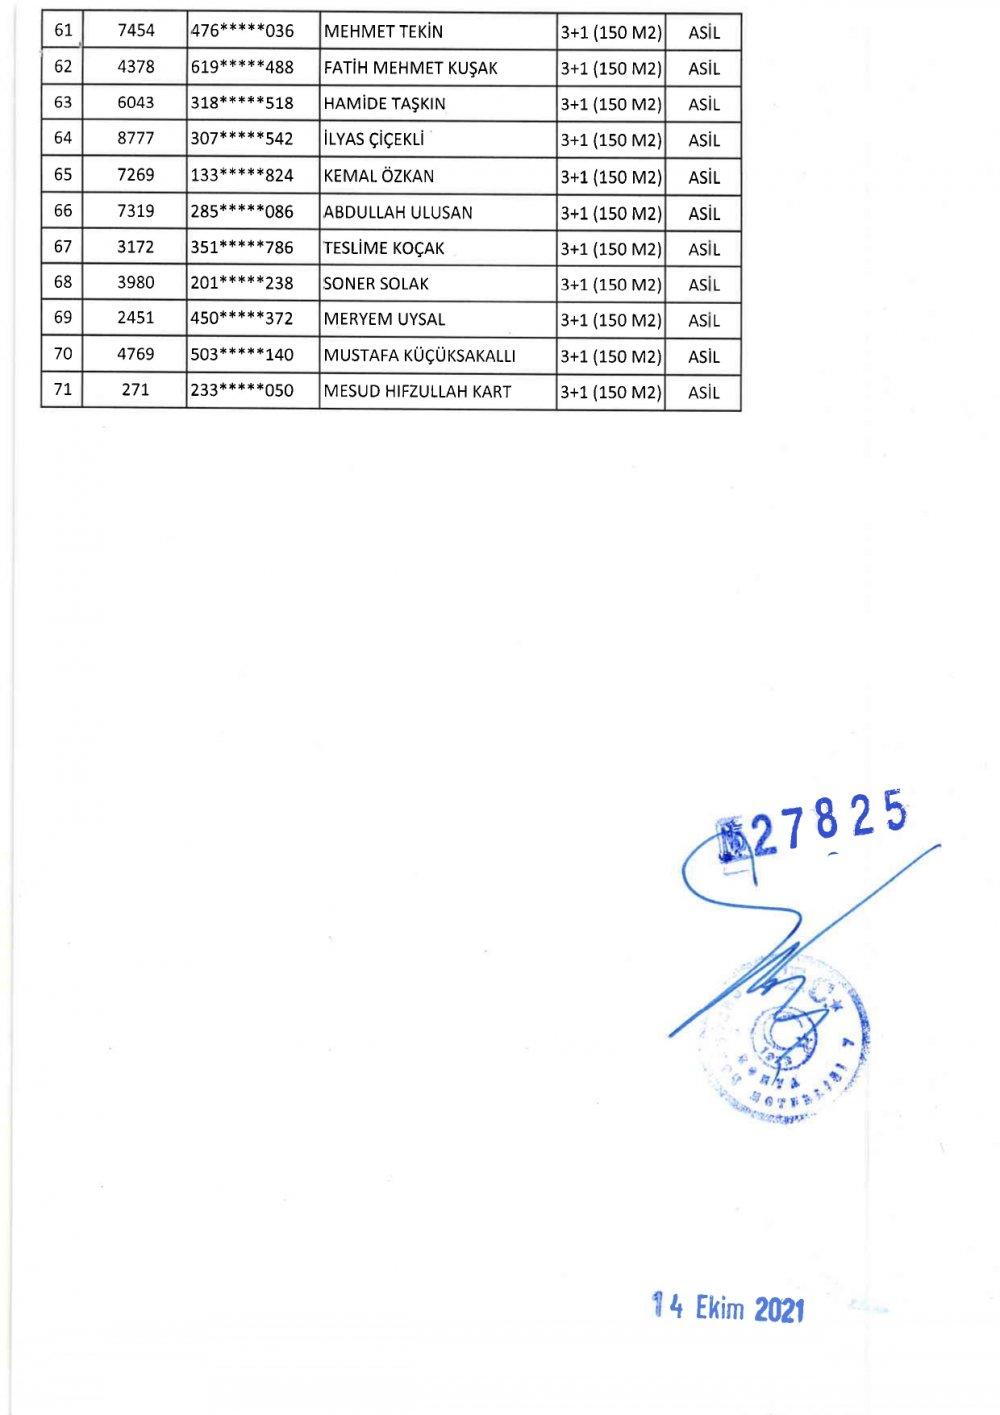 ss-turgutreis-evleri-kyk-kura-cekilis-listesi-page-0008.jpg